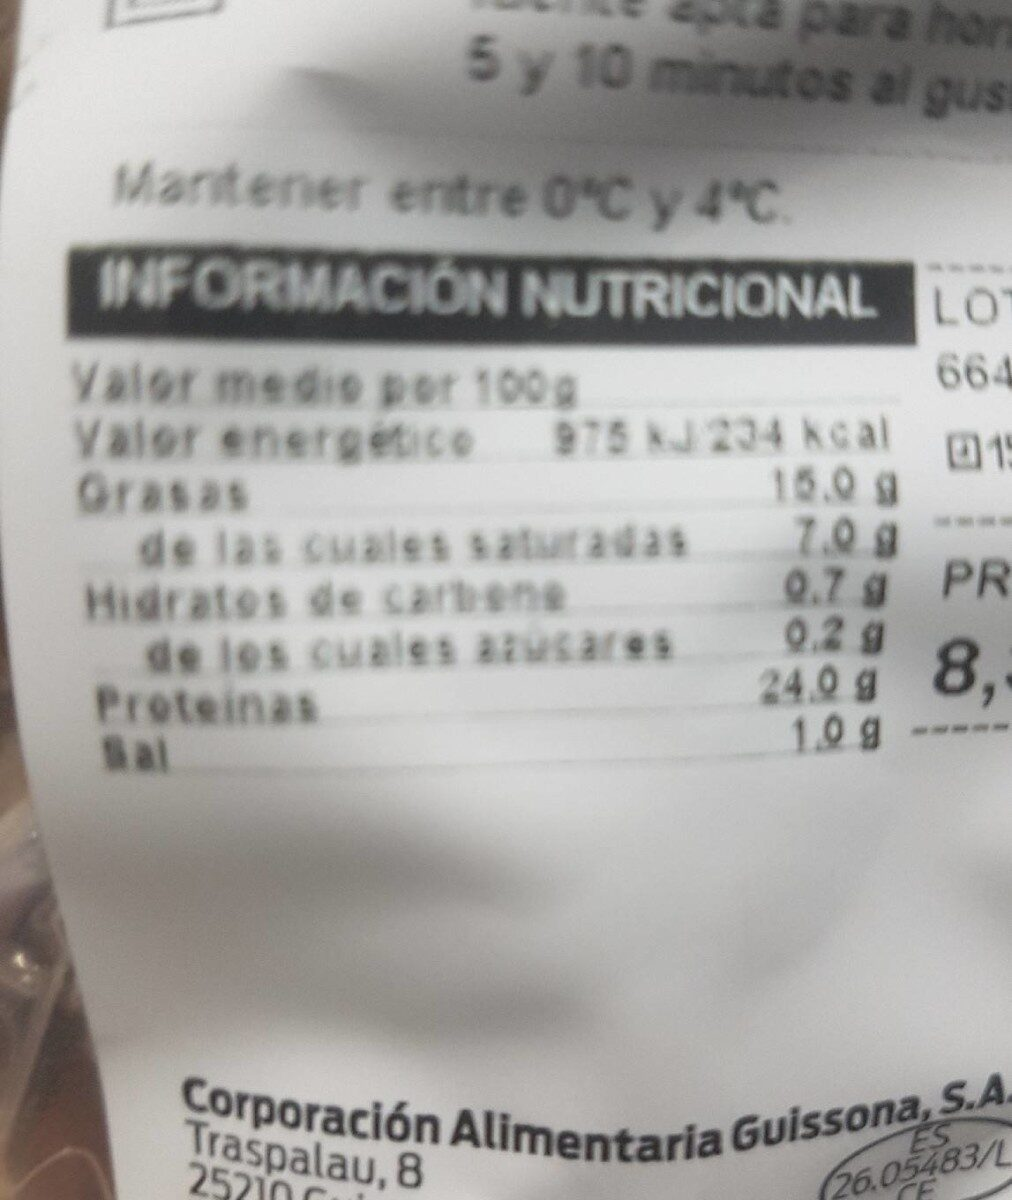 Carrilleras asadas - Valori nutrizionali - es